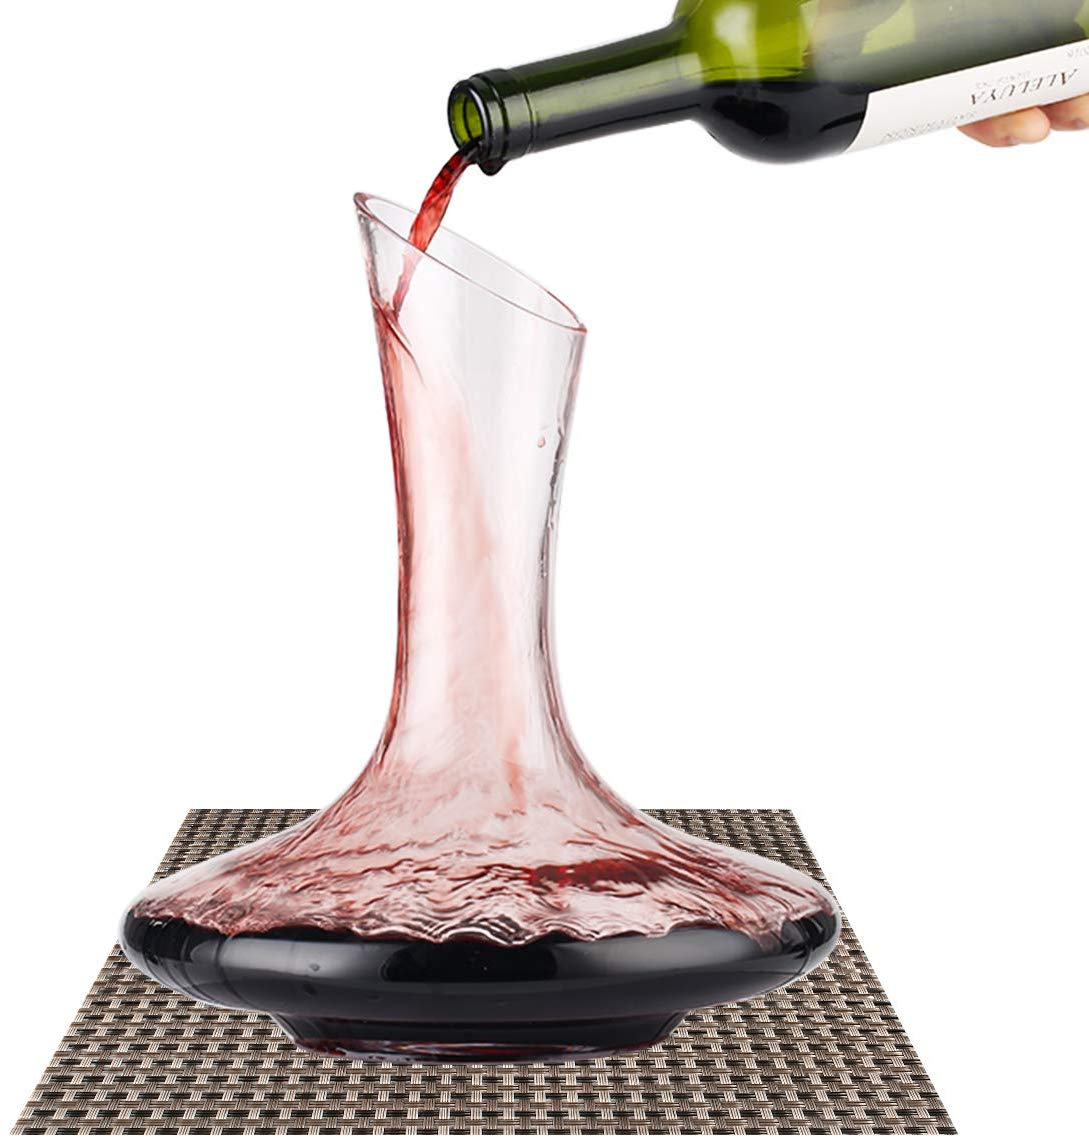 BOQO Wine Decanter, 100% Lead-Free Hand Blown Crystal Glass